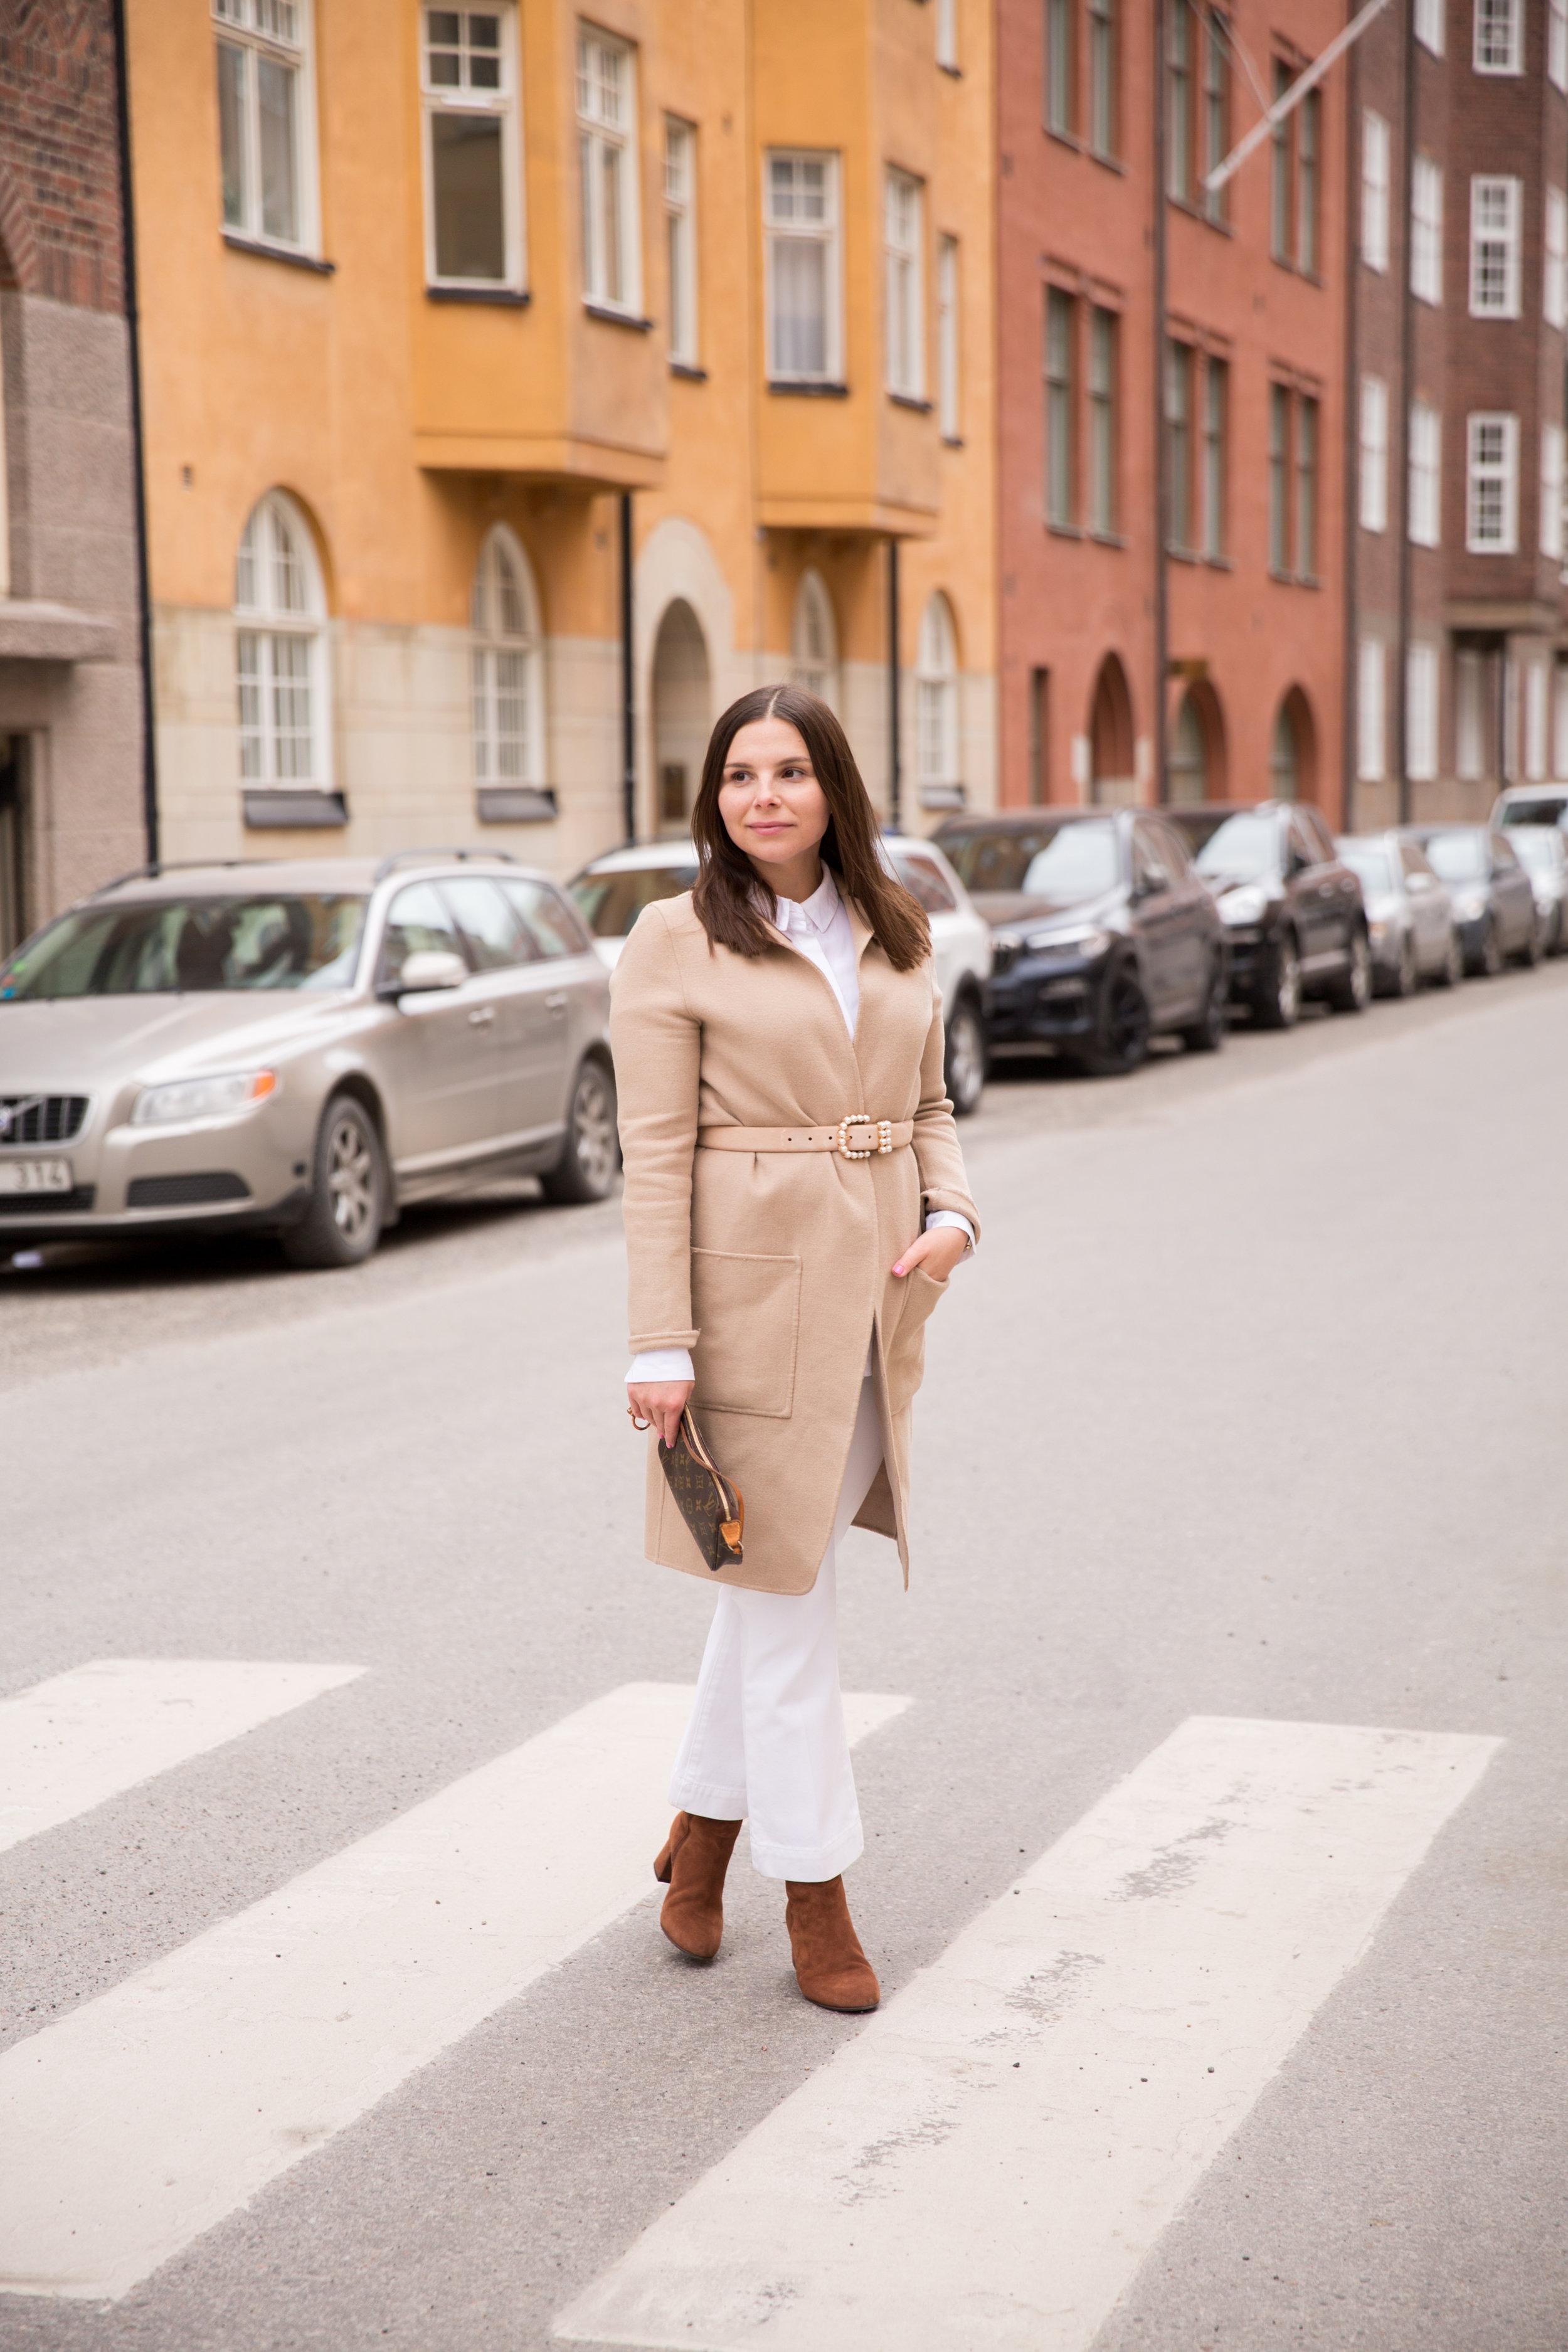 Angelica Aurell mode outfit stil.jpg